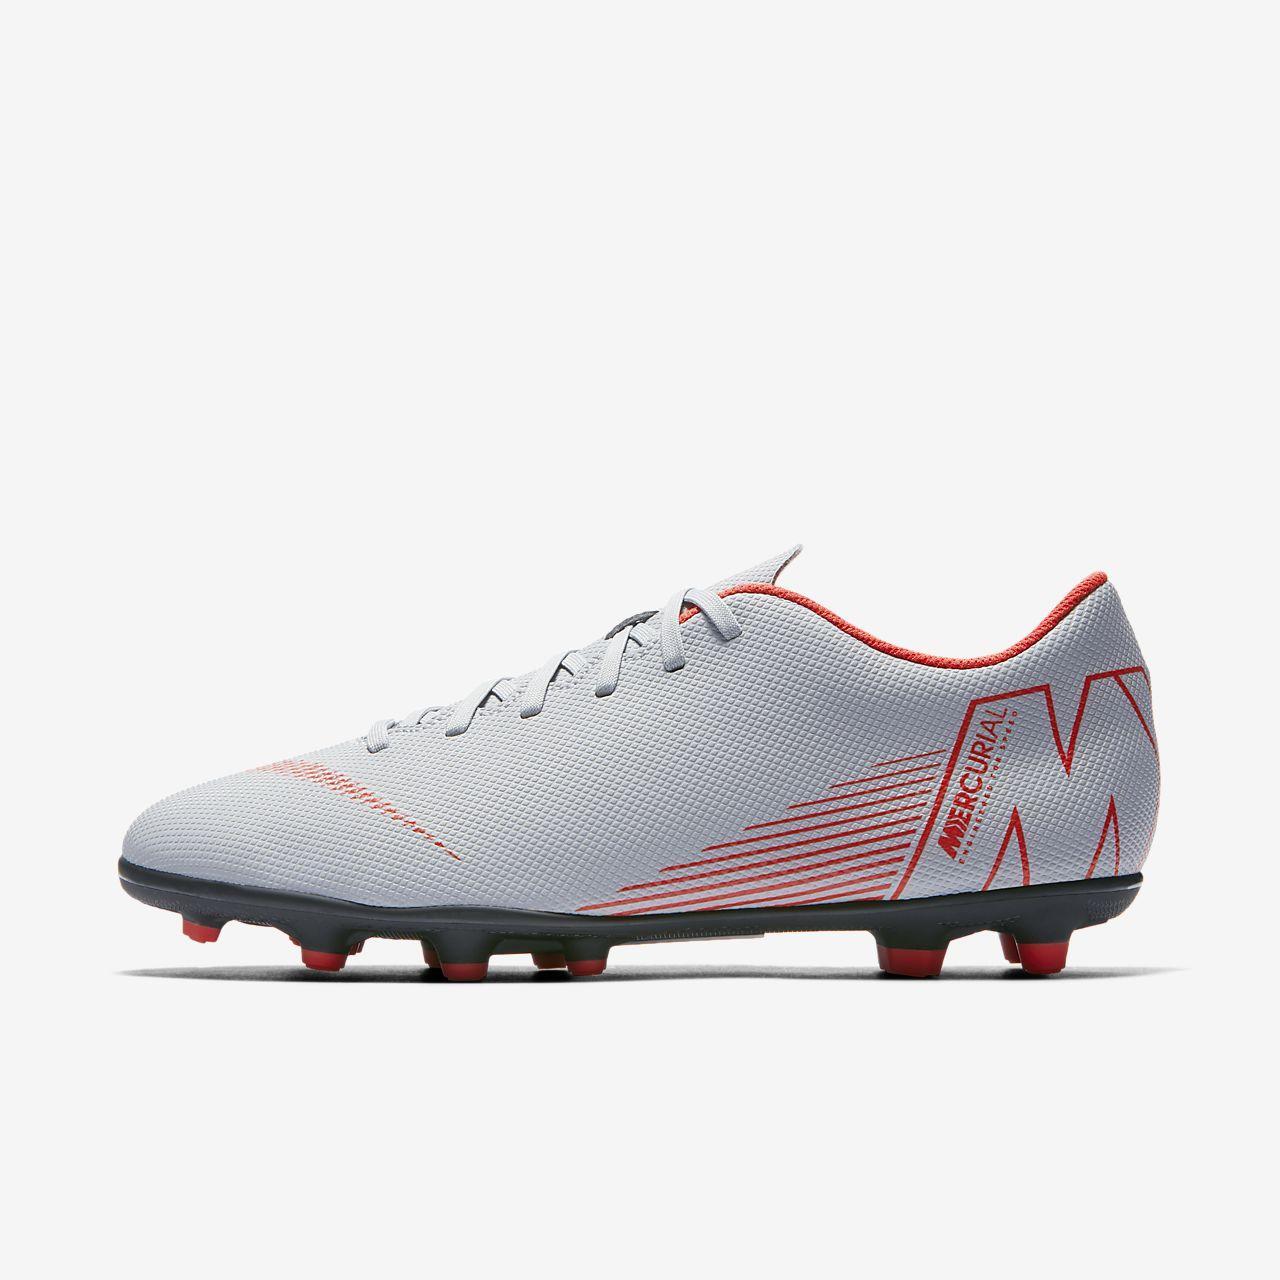 Crampons Mercurial Vapor Multi À De Terrains Chaussure Football Nike 7gYf6yb